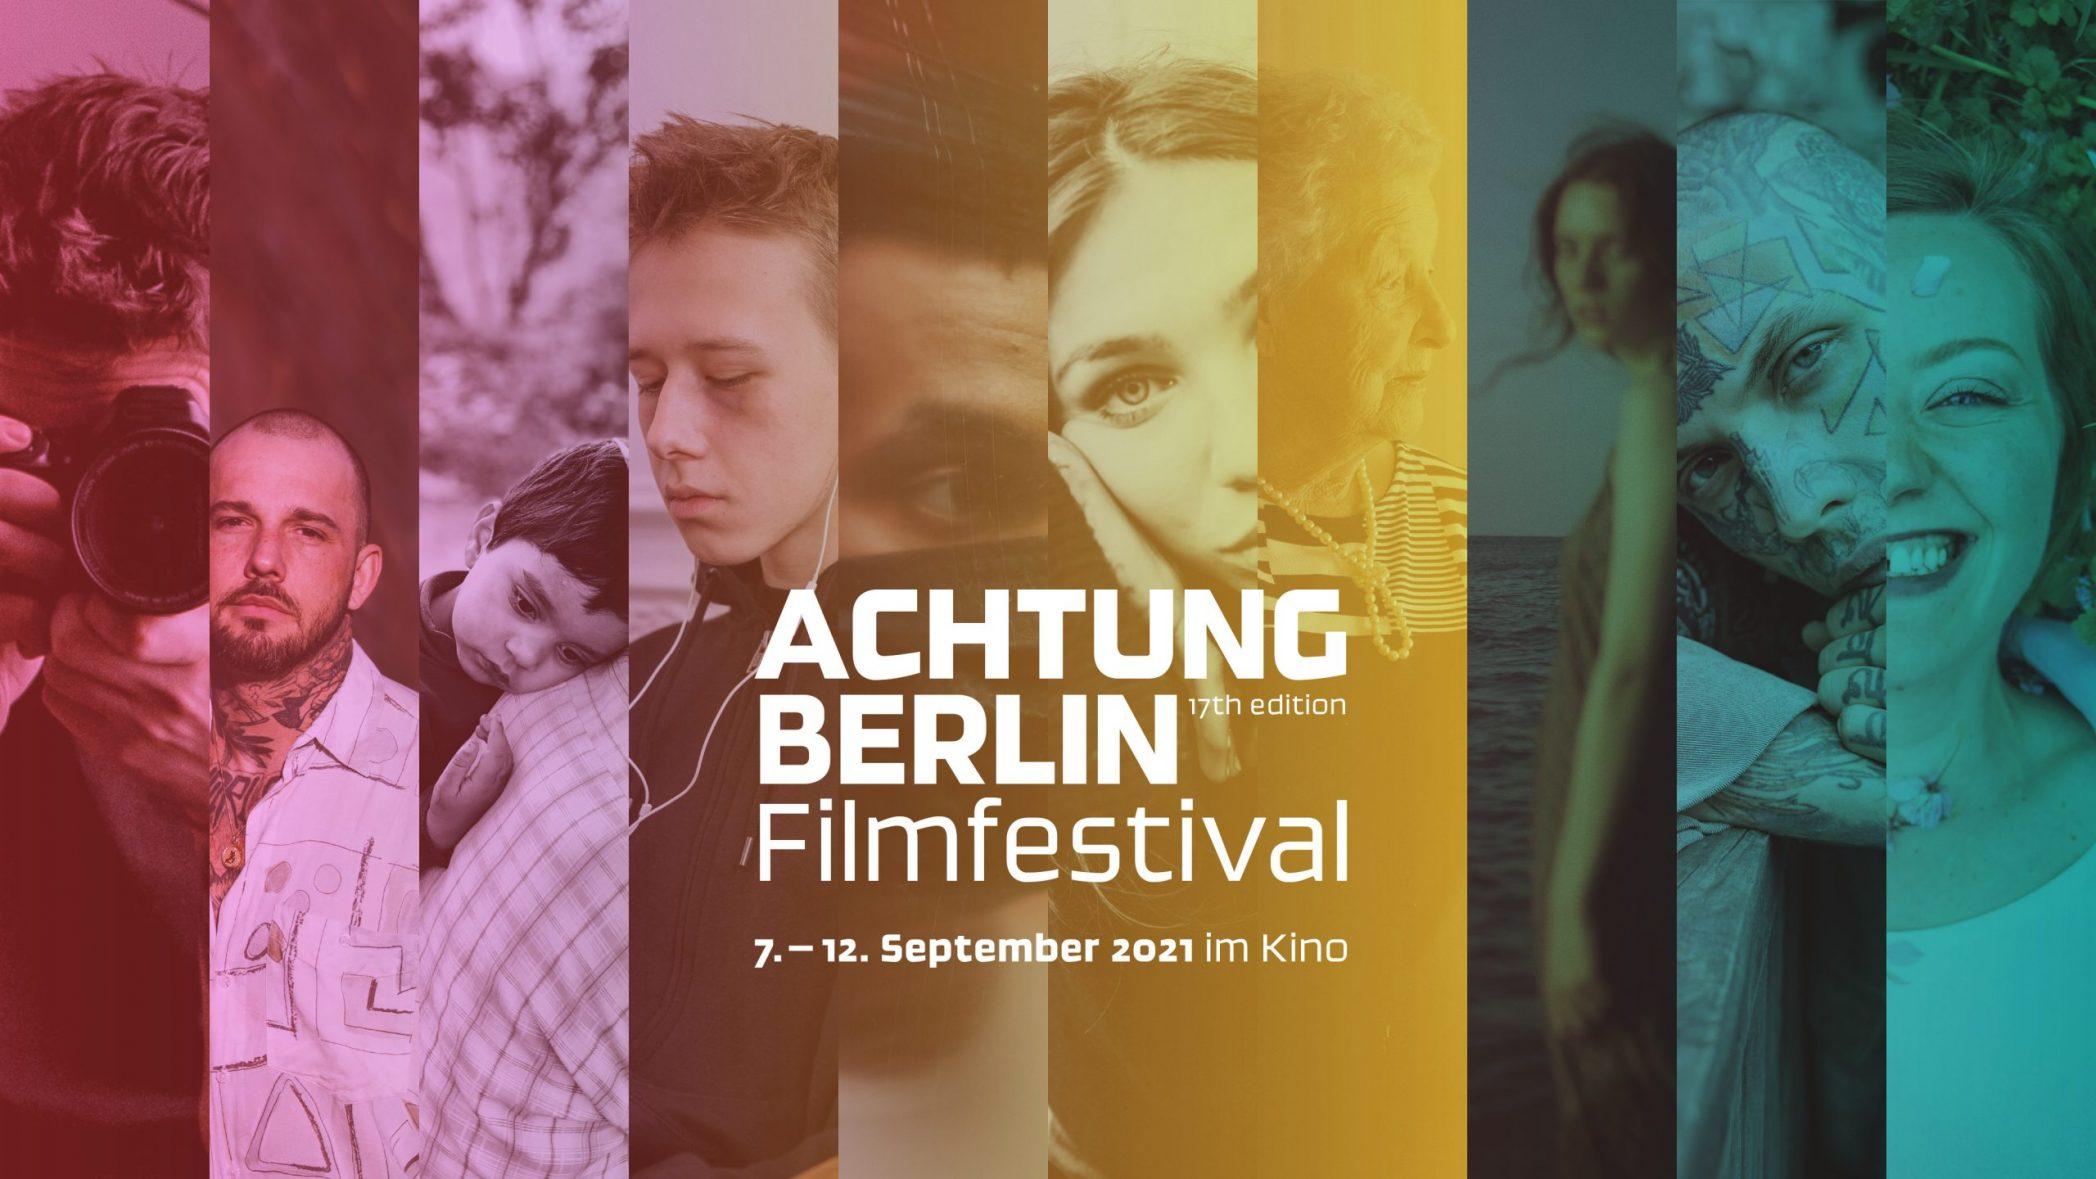 Achtung Berlin Filmfestival